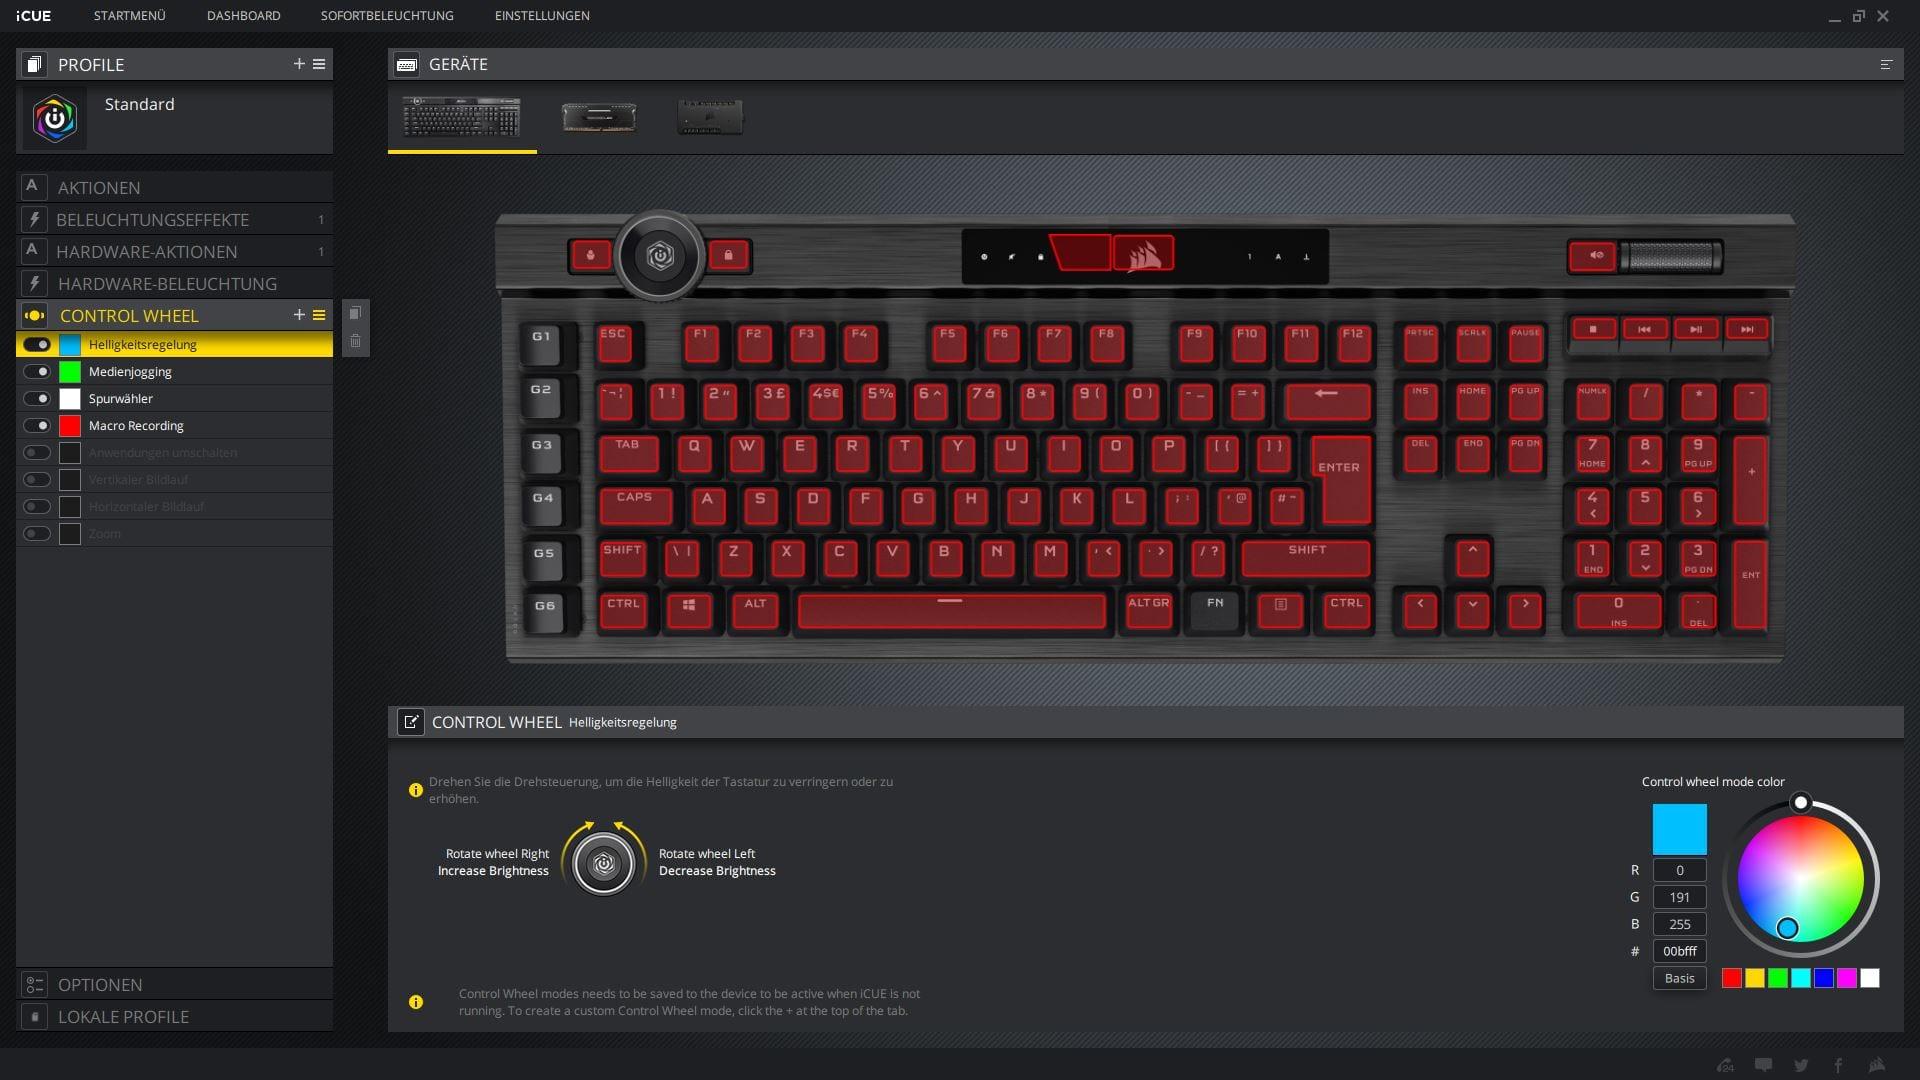 K100 RGB iCUE Kontrollrad